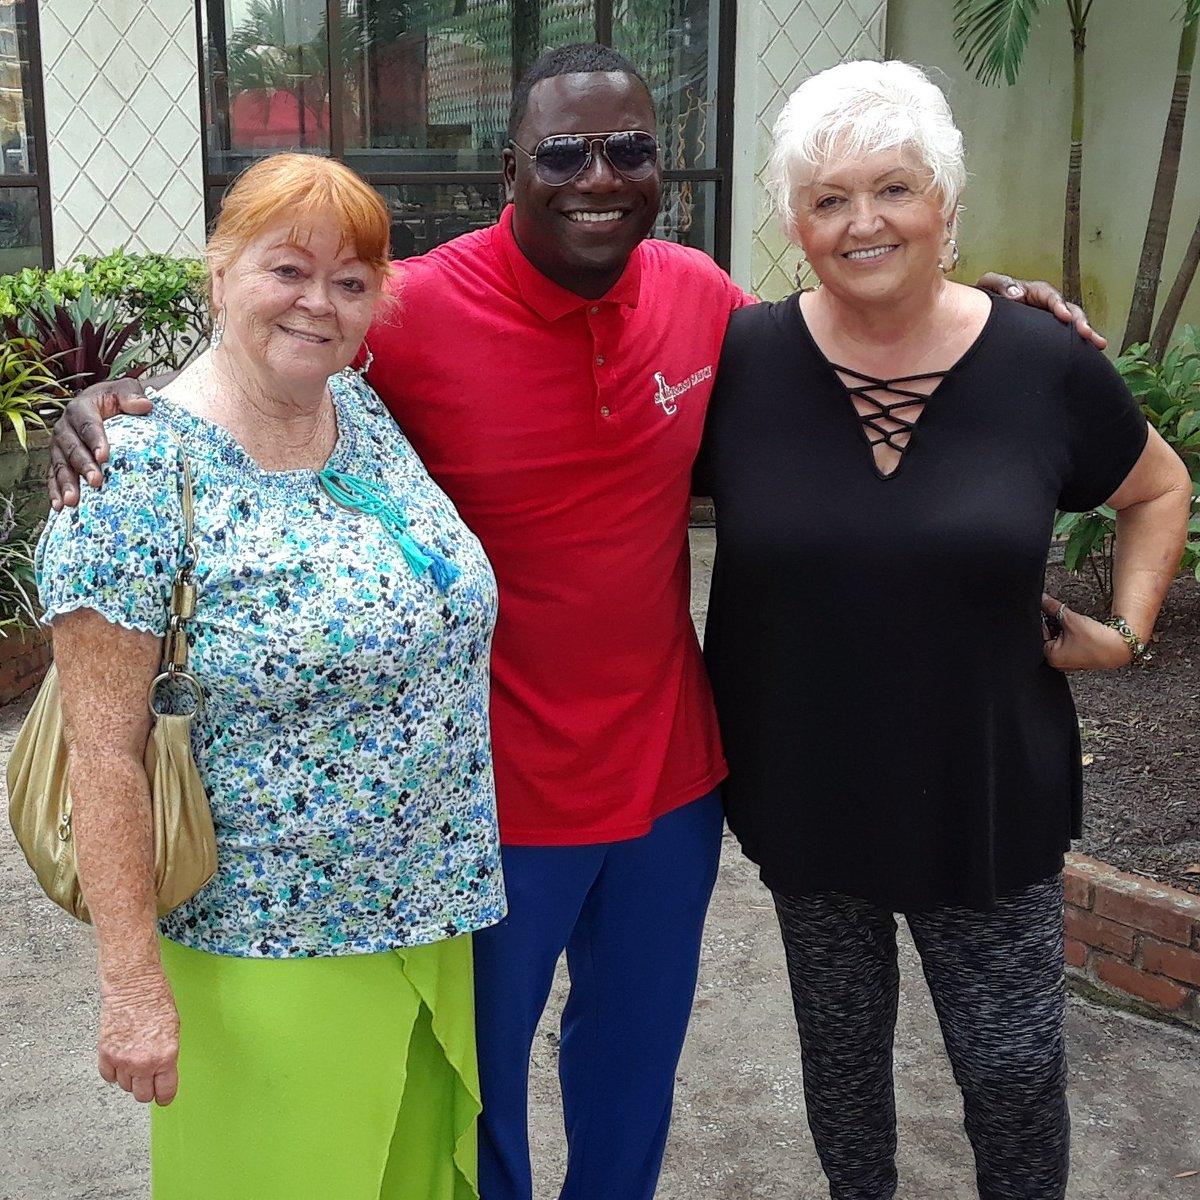 Started in Liberty City (Miami) #DarrylJohnson  #FoodandBeverage #Entrepreneur #dadecounty  #miami<br>http://pic.twitter.com/vlzqyuPUkH